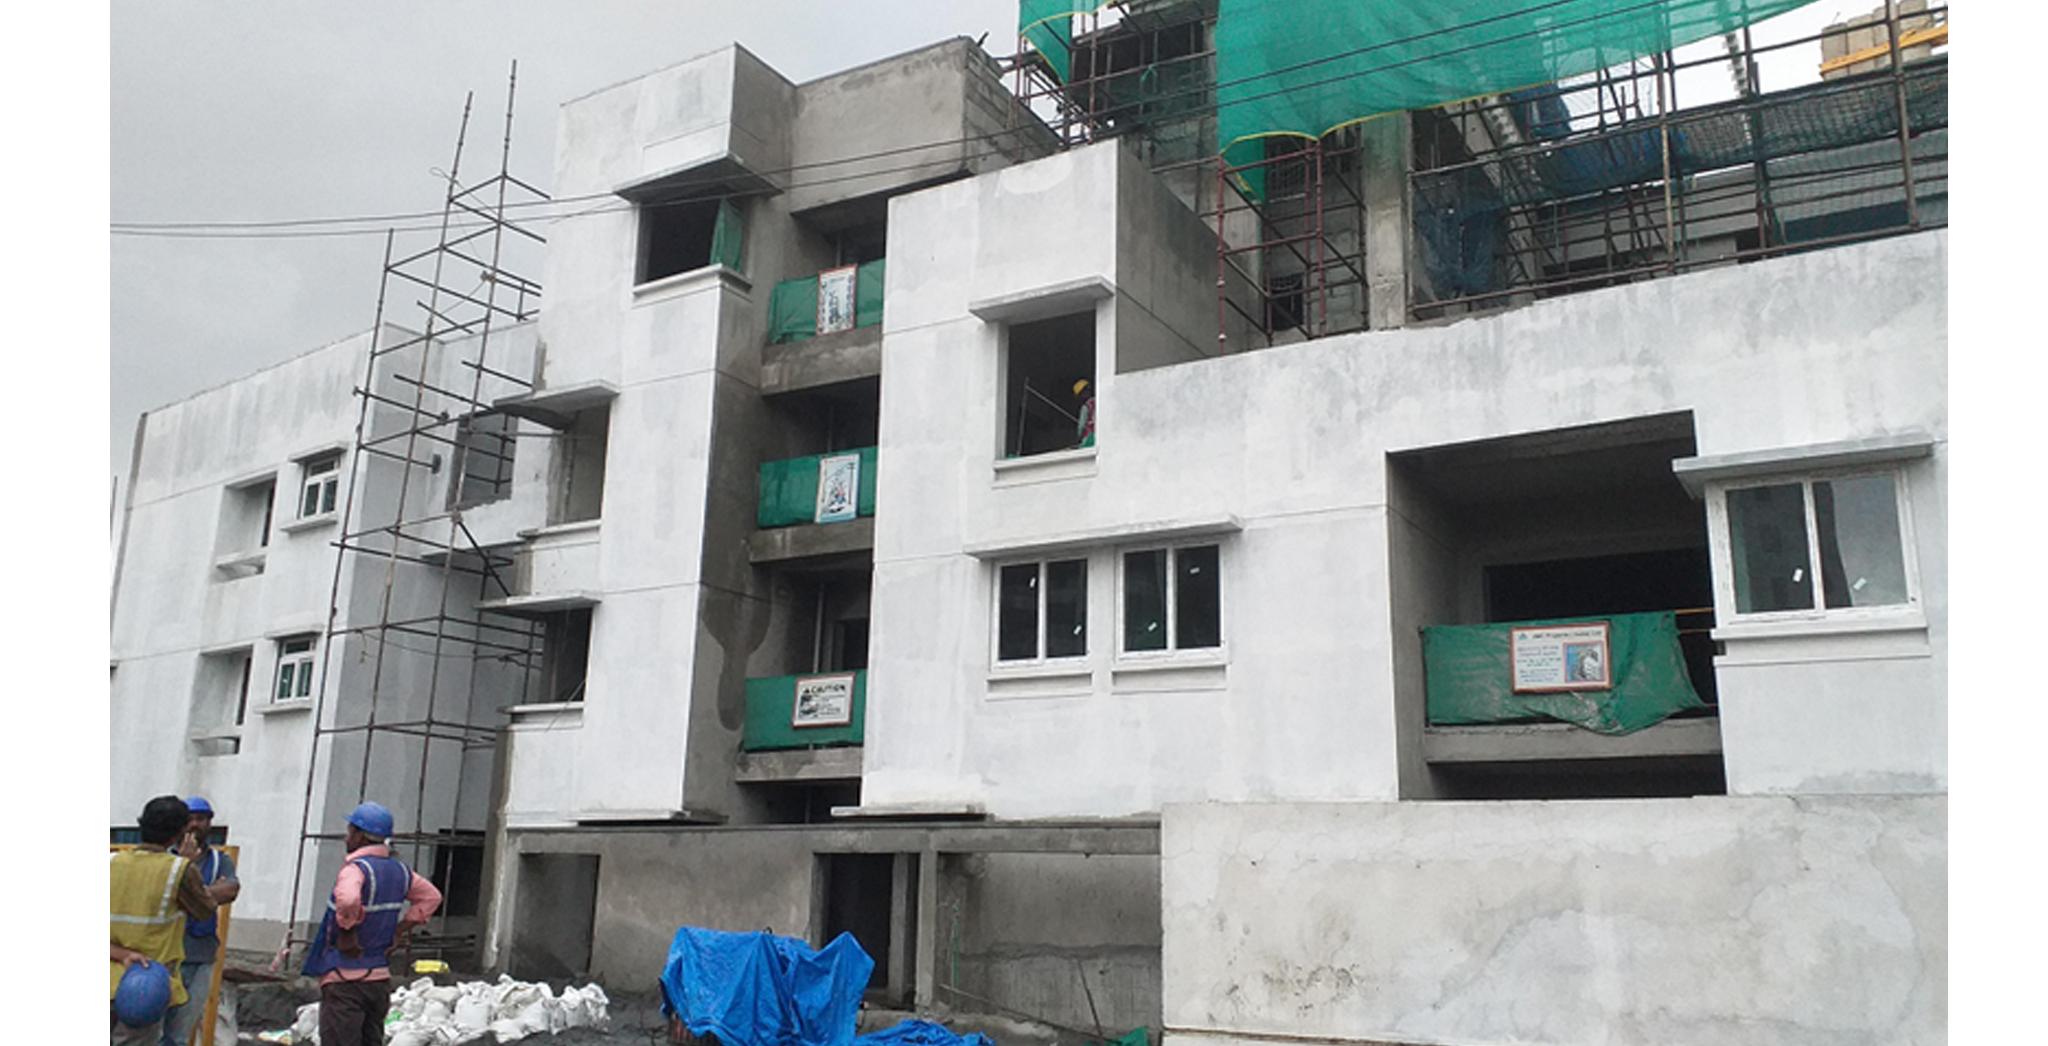 Aug 2021 - Block C: East side view - External plastering works completed, external primer works in progress at east side